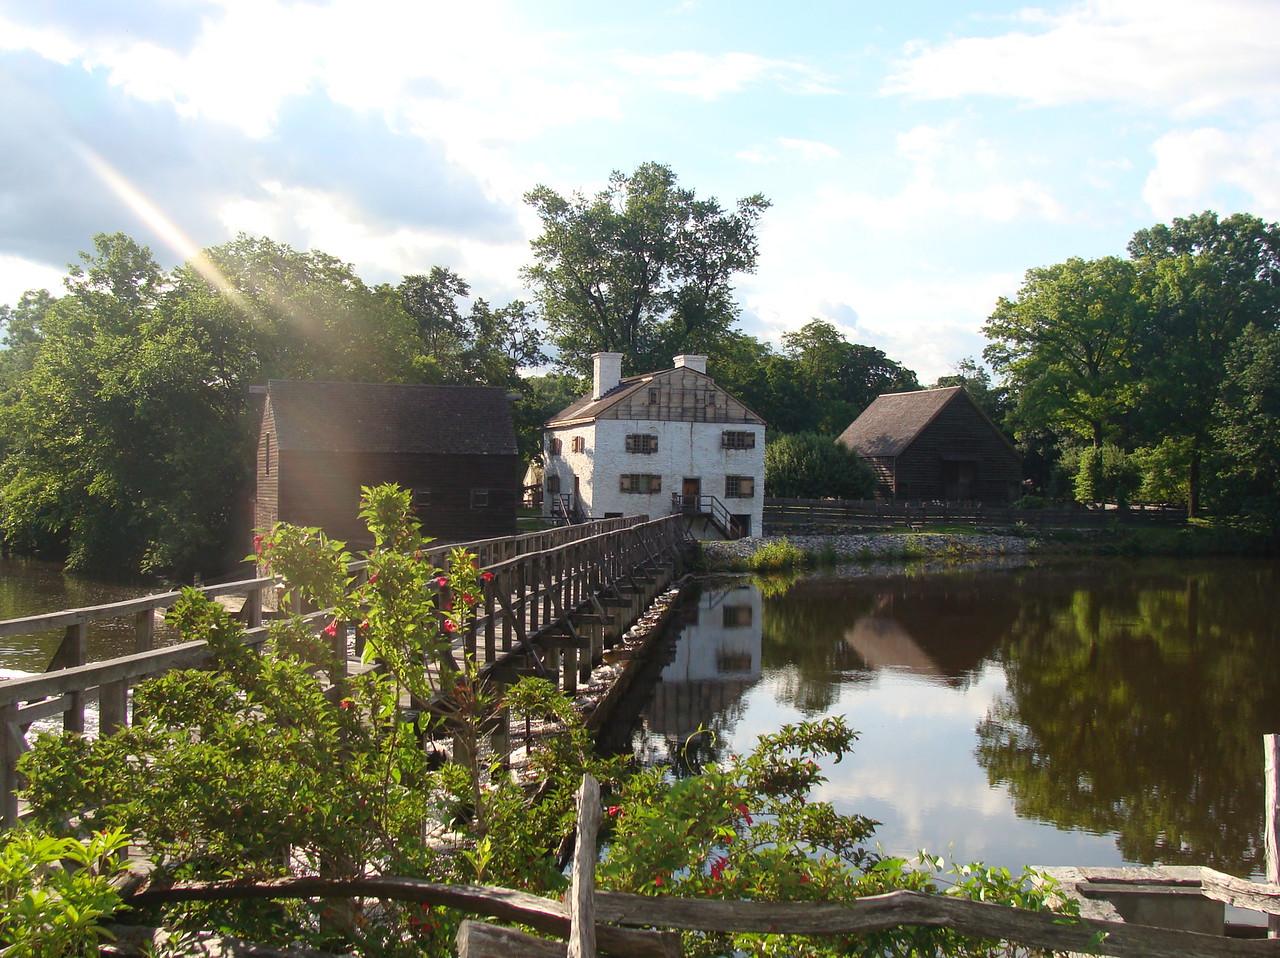 Historic Philipsburg Manor and Bridge